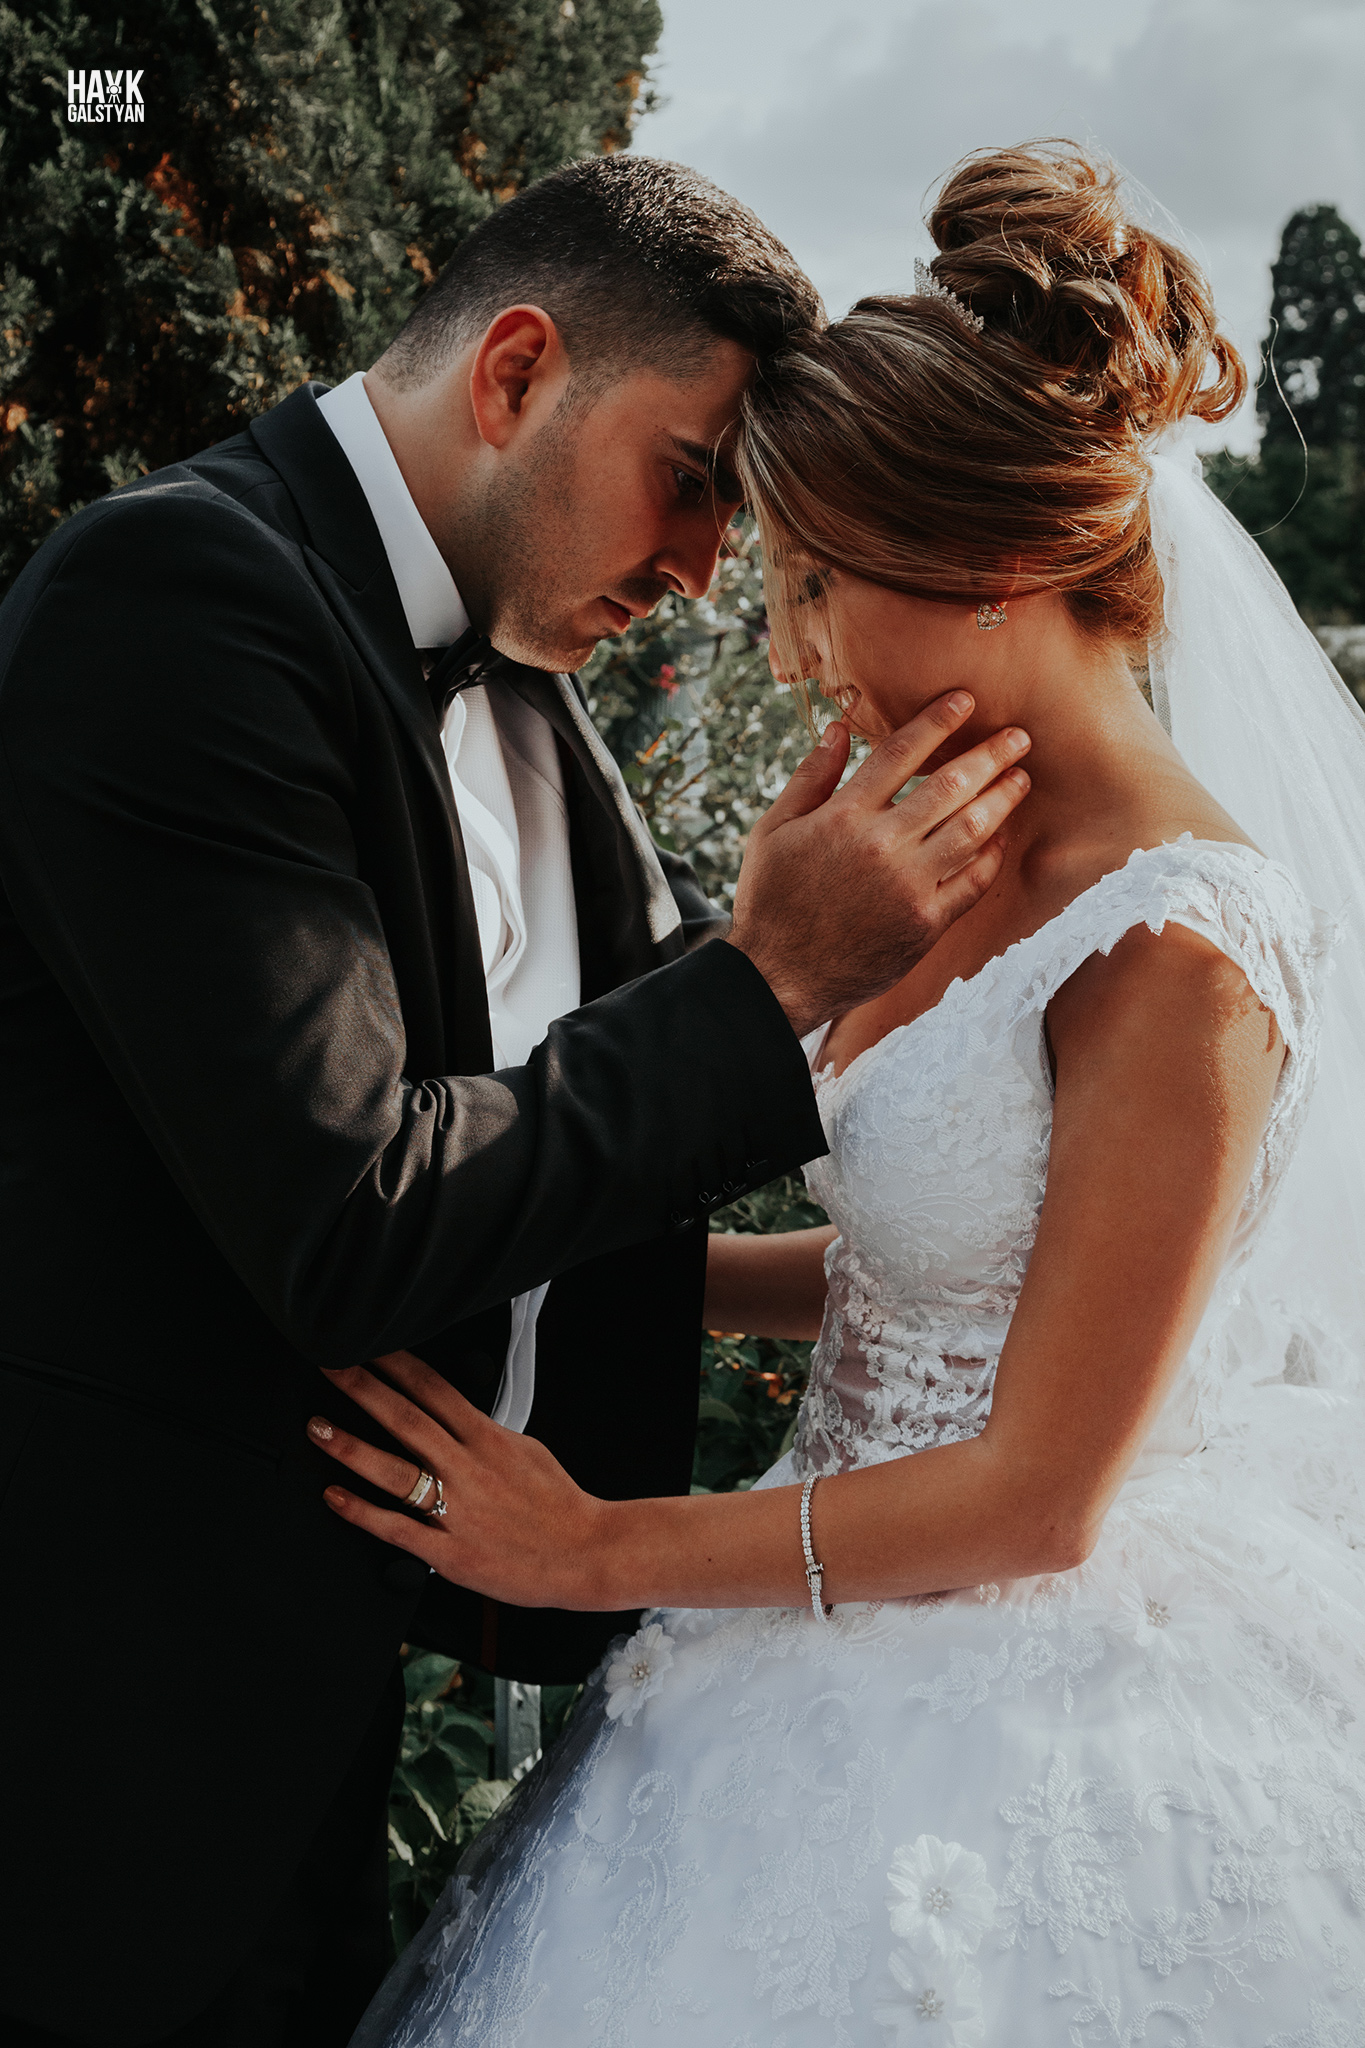 Bride and Groom in Paris by photographer Hayk Galstyan